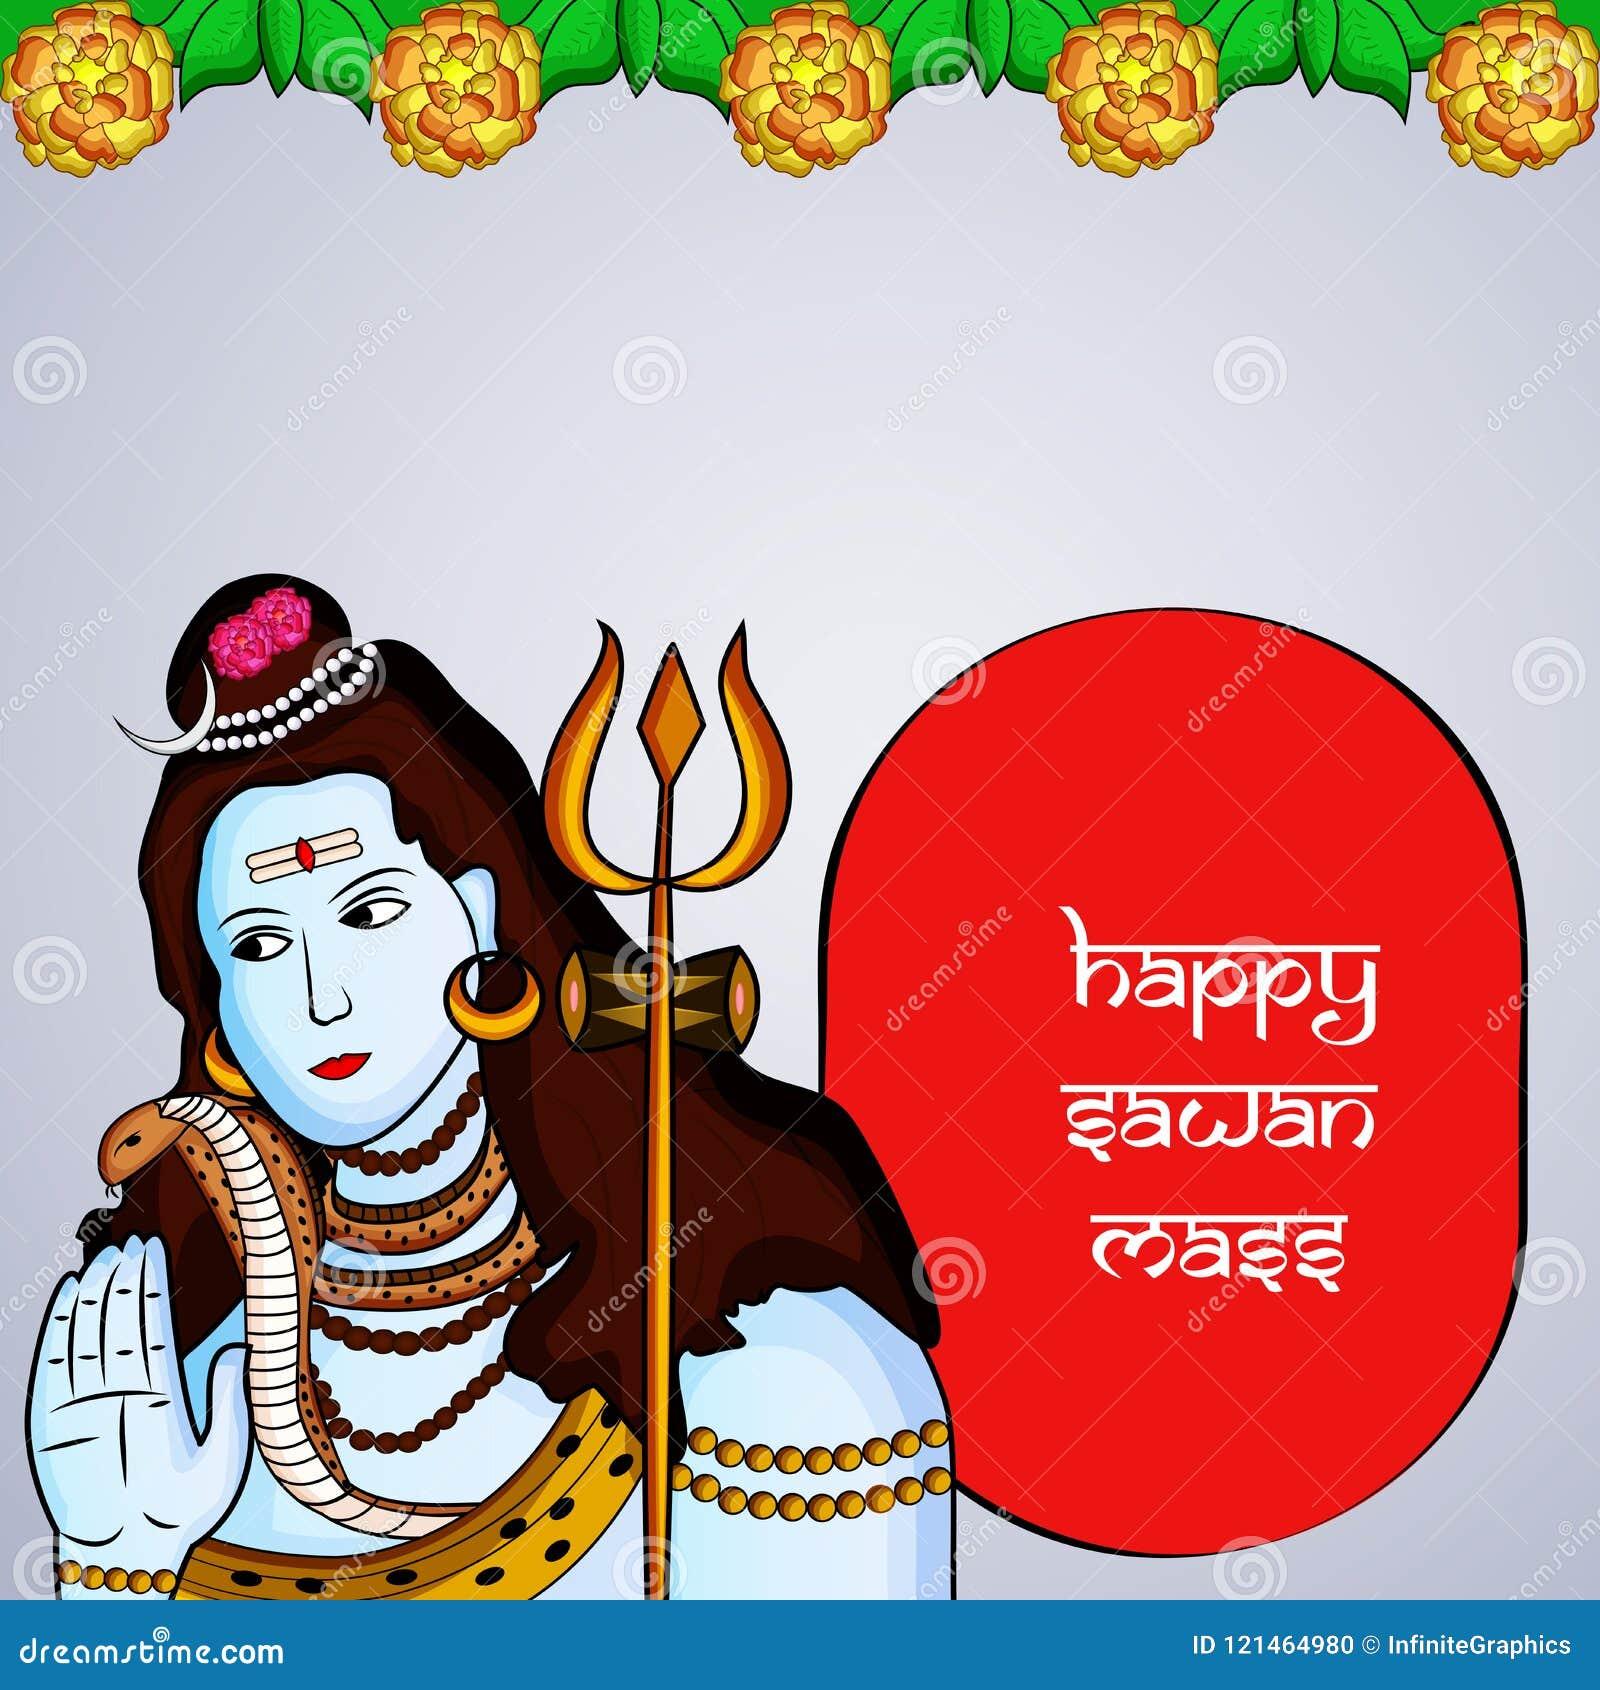 Illustration of hindu festival Sawan Mass